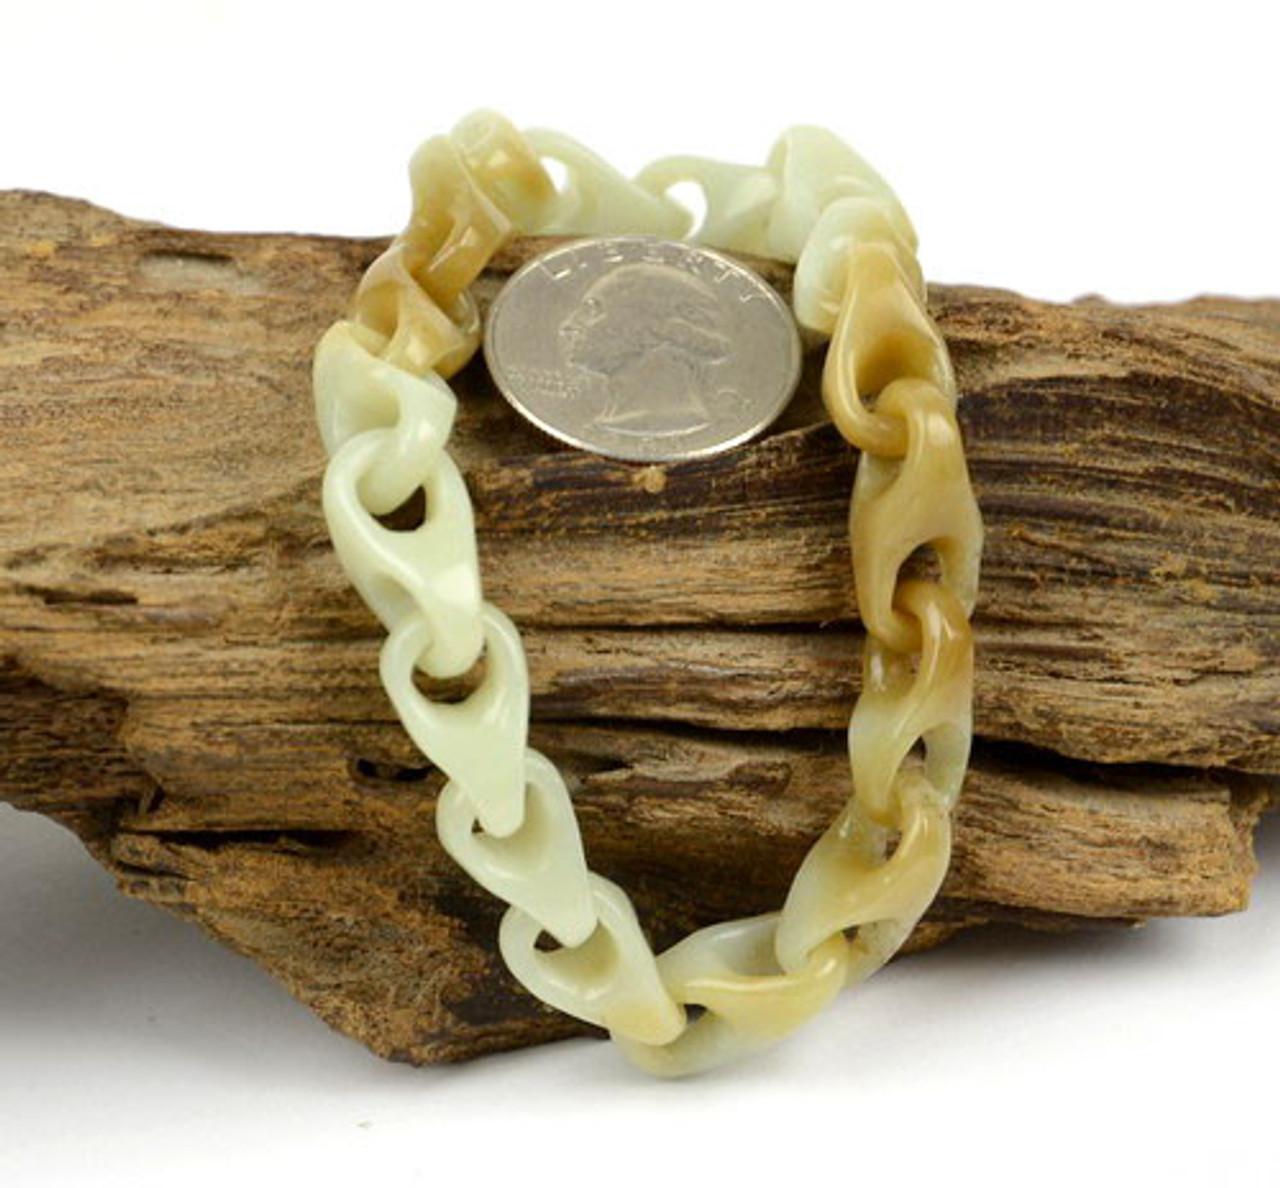 Hand Carved White Nephrite Jade Gemstone Loop Chain /Bracelet w/ Certificate